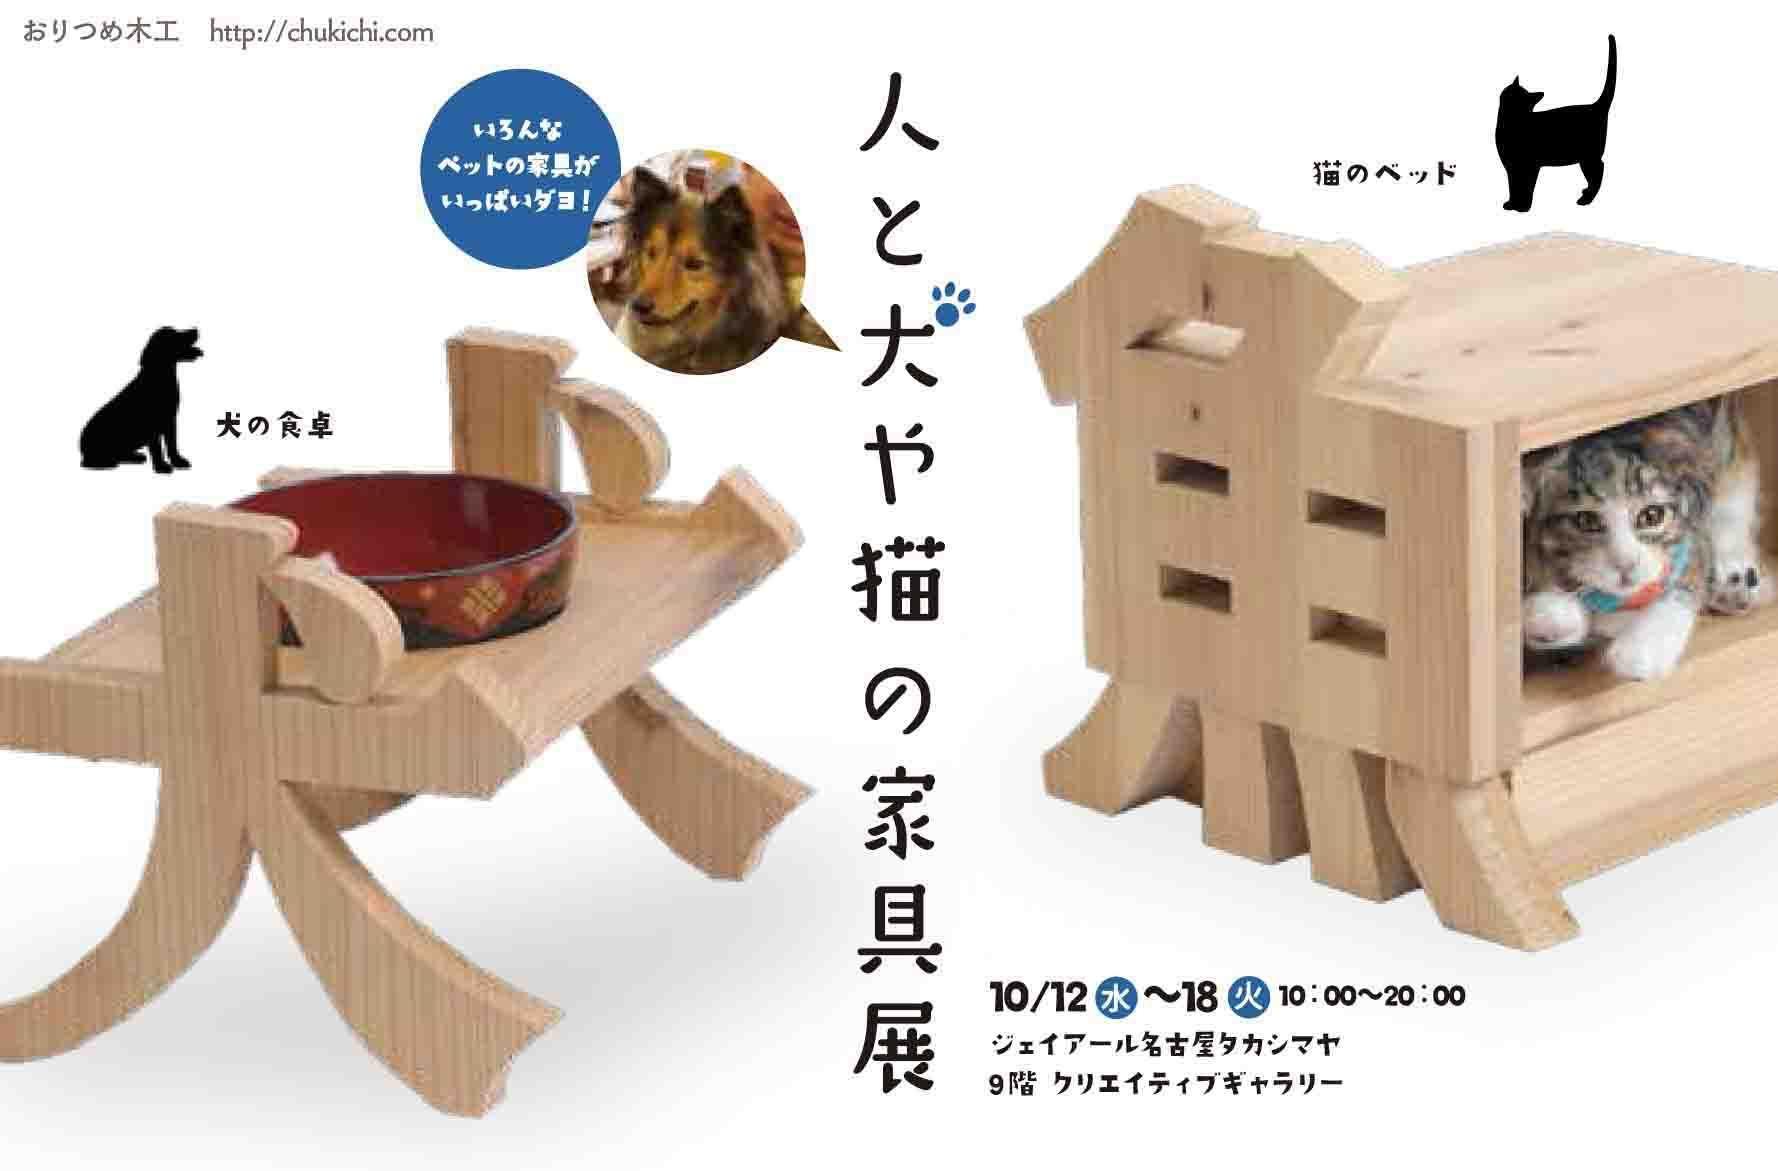 JR名古屋タカシマヤ  展示会_f0206159_16582869.jpg